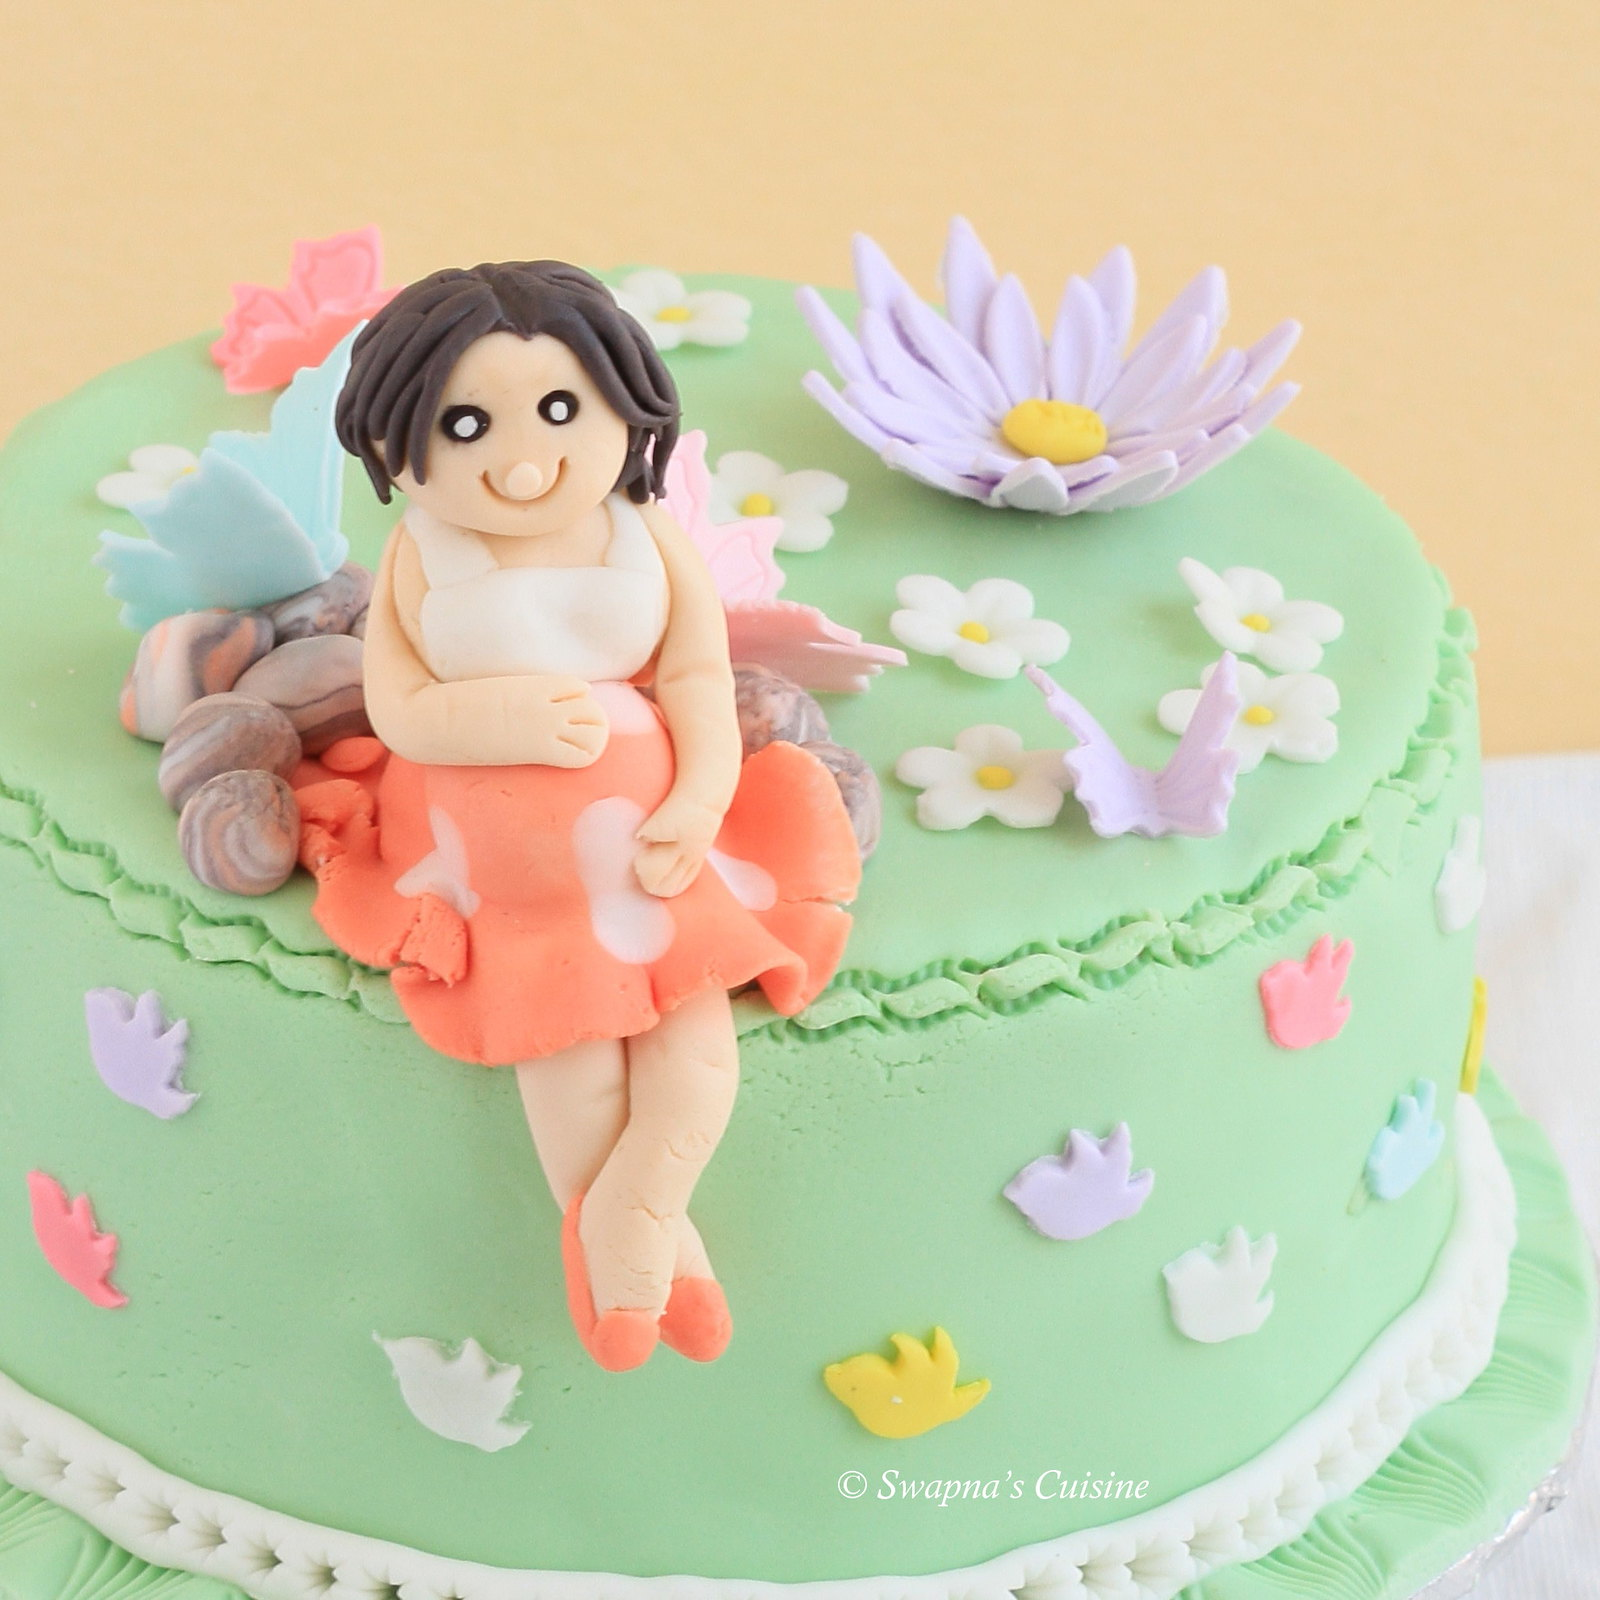 Fondant Pregnant Lady Cake